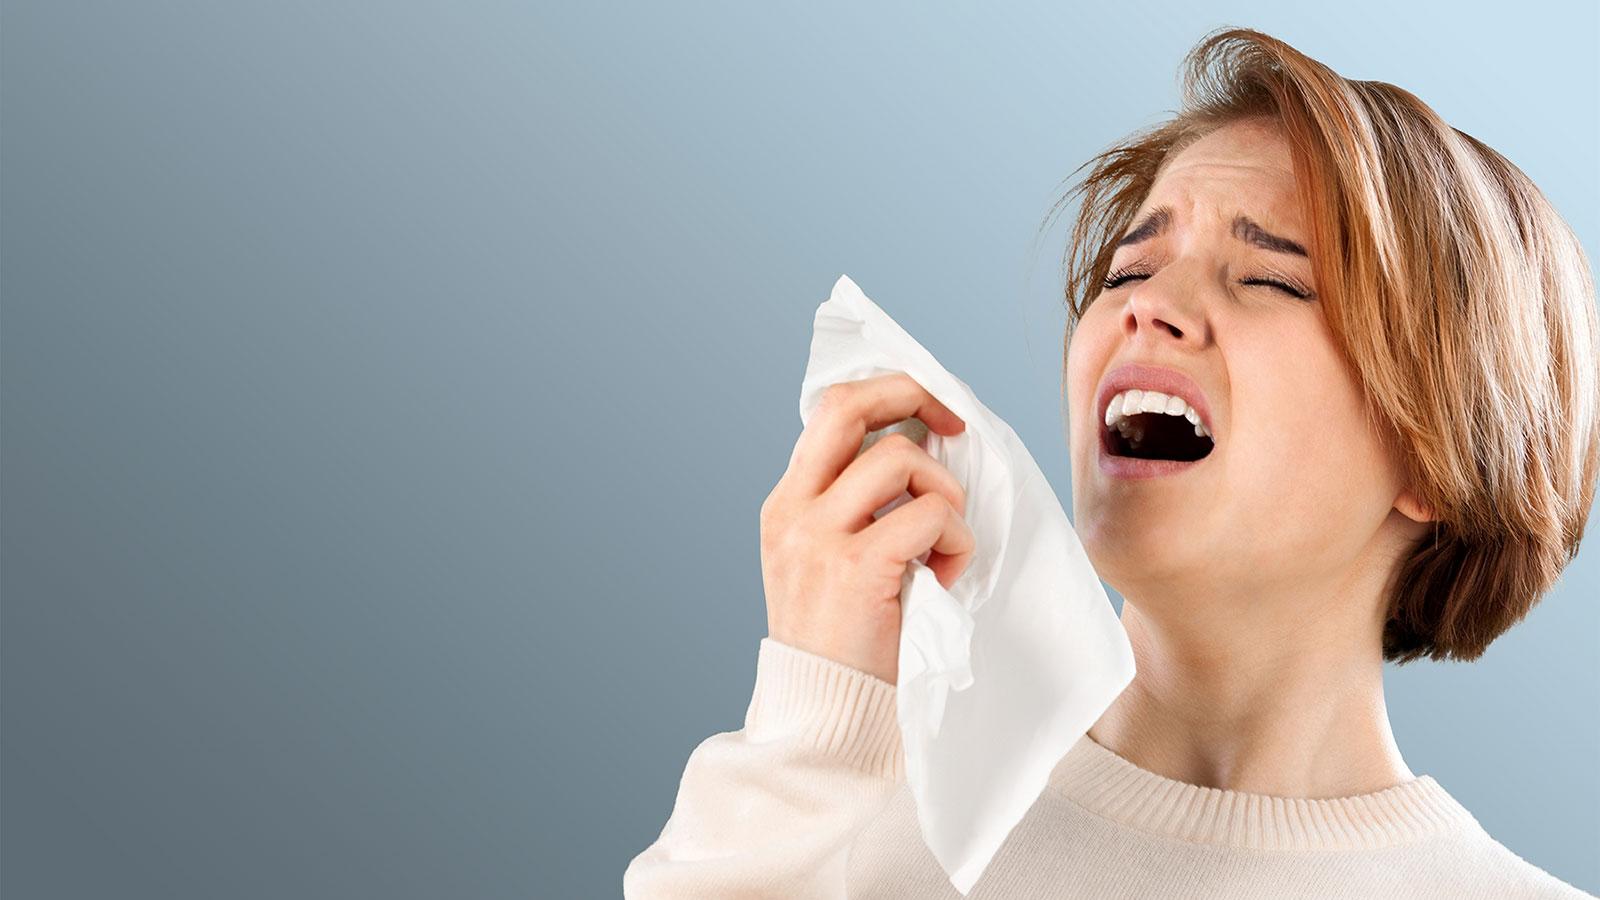 Como desentupir o nariz naturalmente